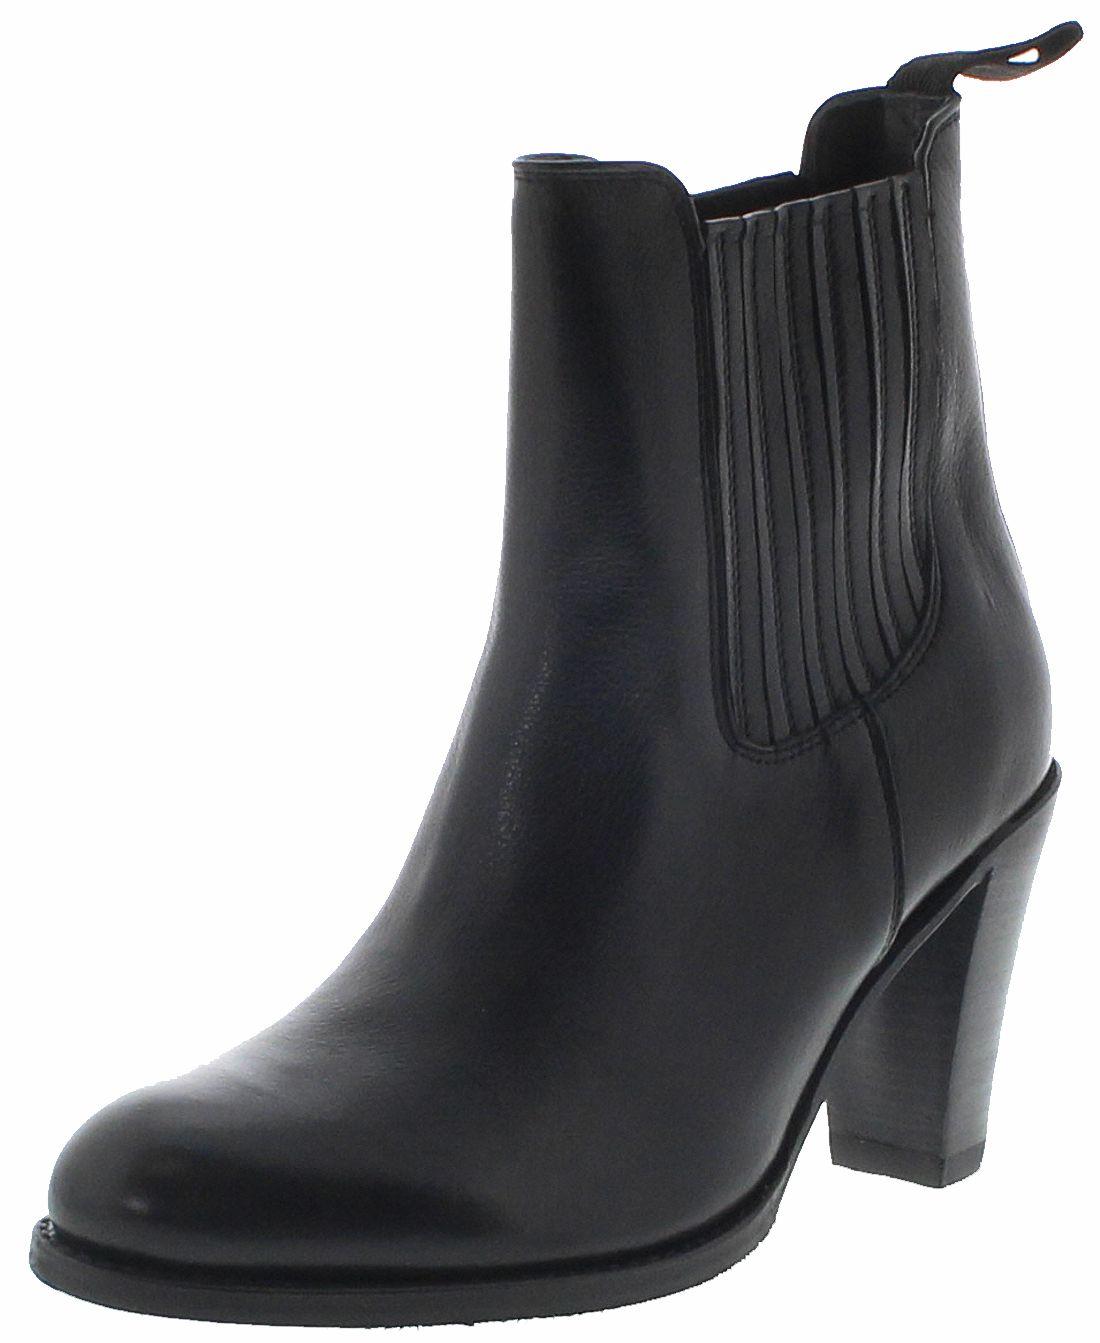 FB Fashion Boots SOFIA Negro ladies ankle boot - black